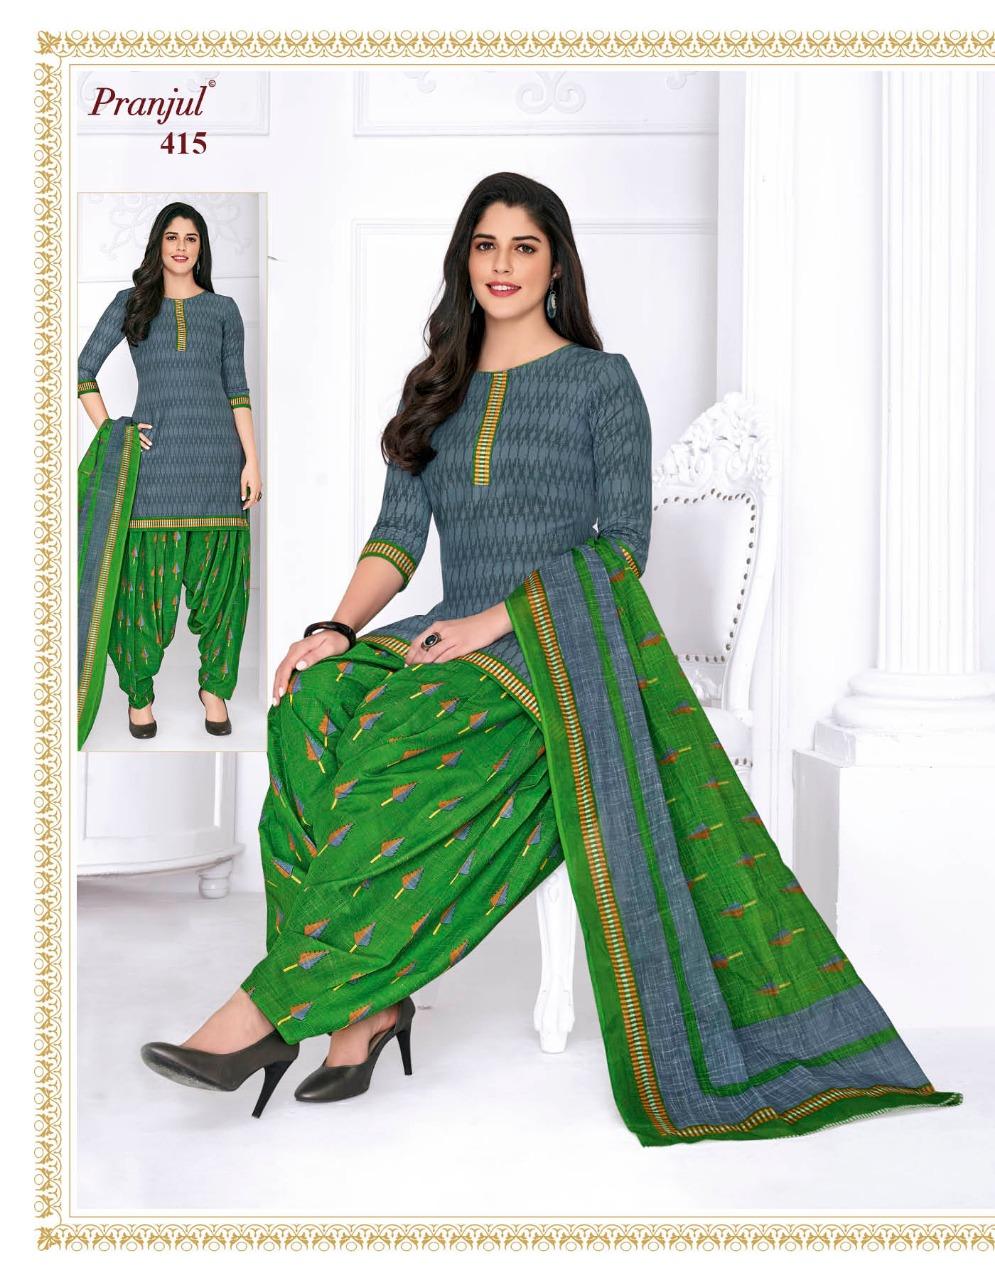 Pranjul Priyanka Vol 4 A Readymade Suit Wholesale Catalog 15 Pcs 12 - Pranjul Priyanka Vol 4 A Readymade Suit Wholesale Catalog 15 Pcs